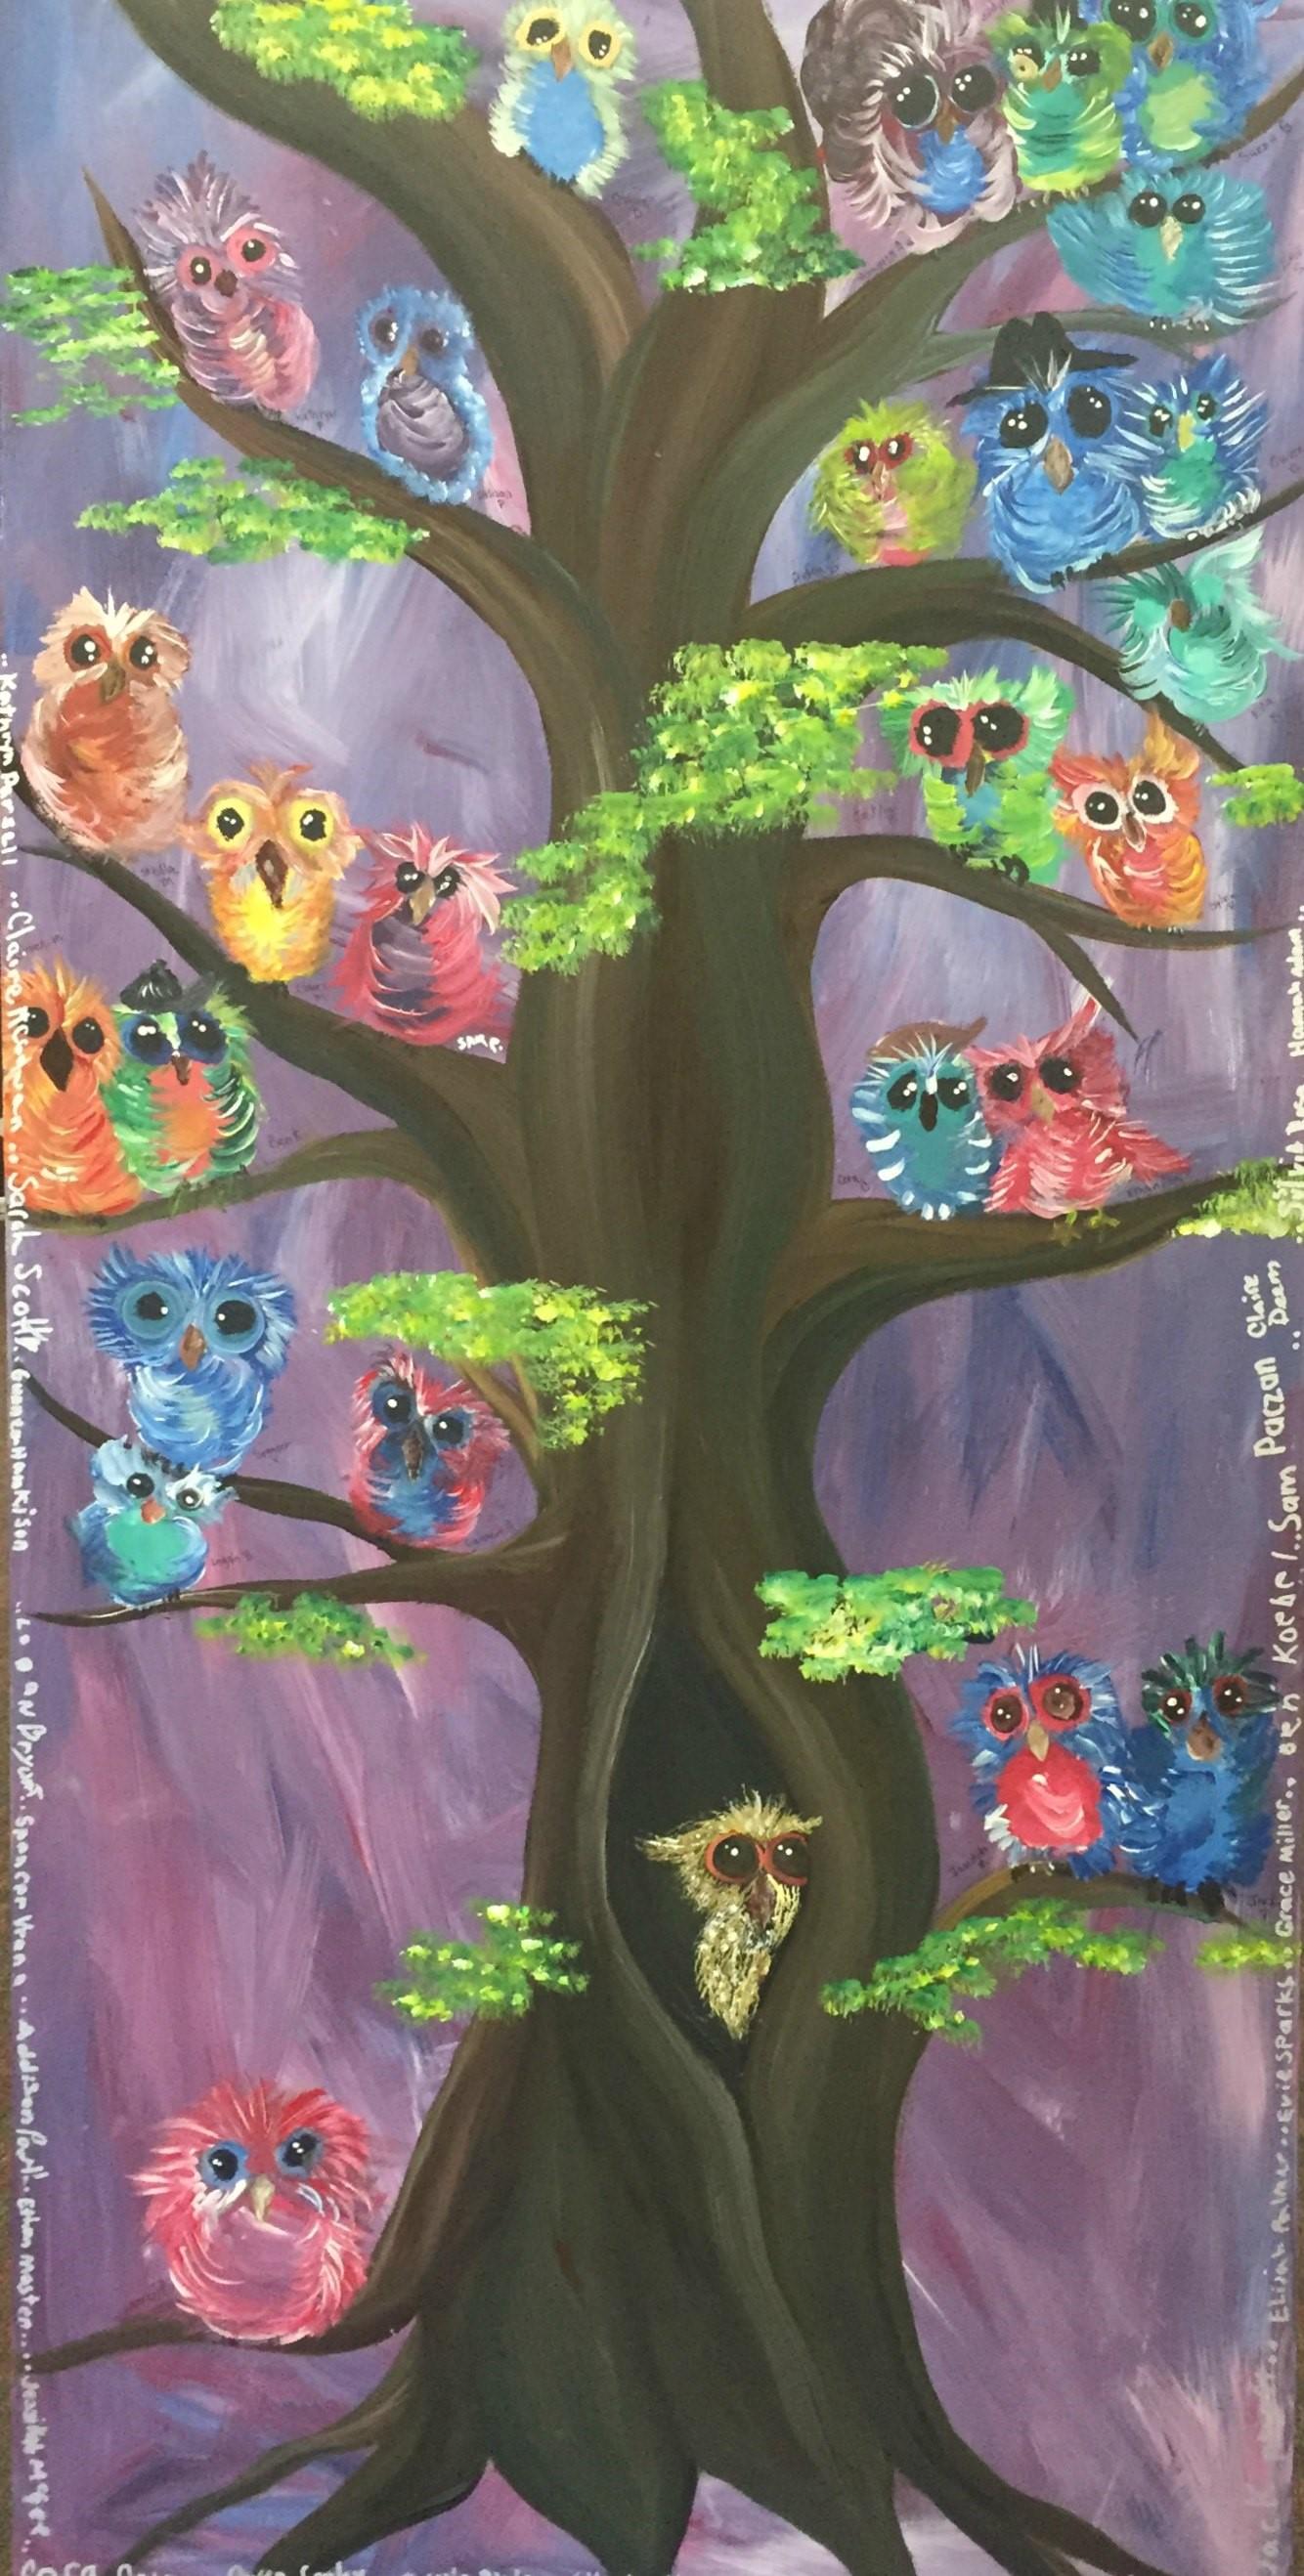 FCA Art Painting 4